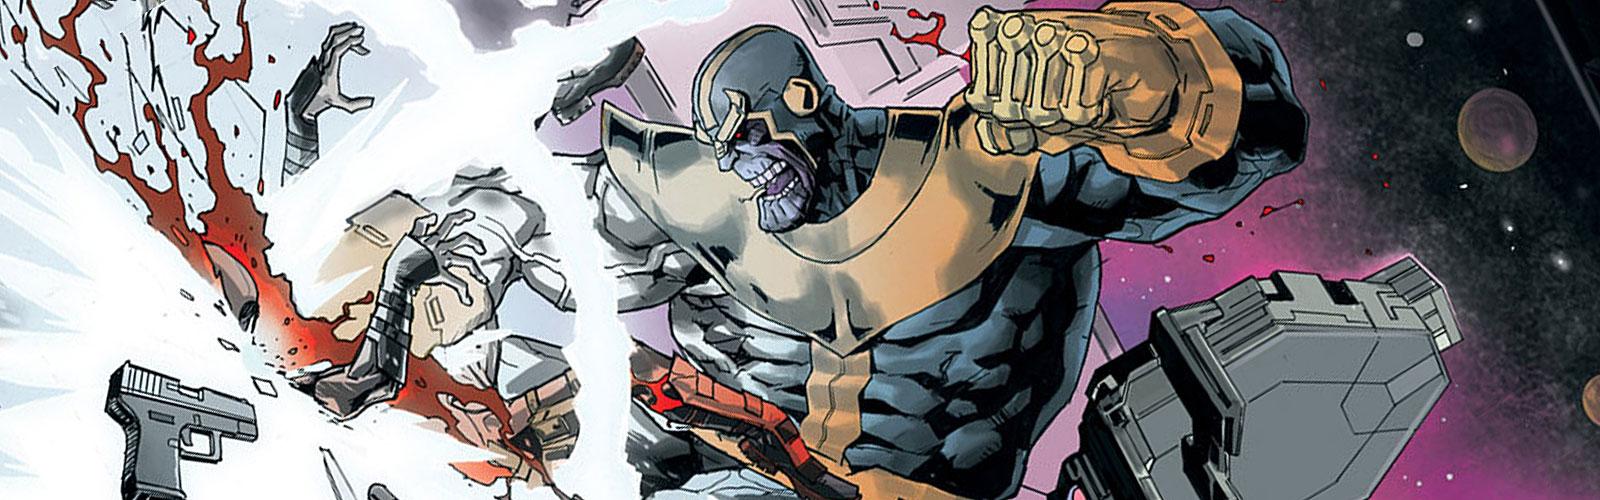 New-Releases - 02-09-15: Deadpool Vs Thanos